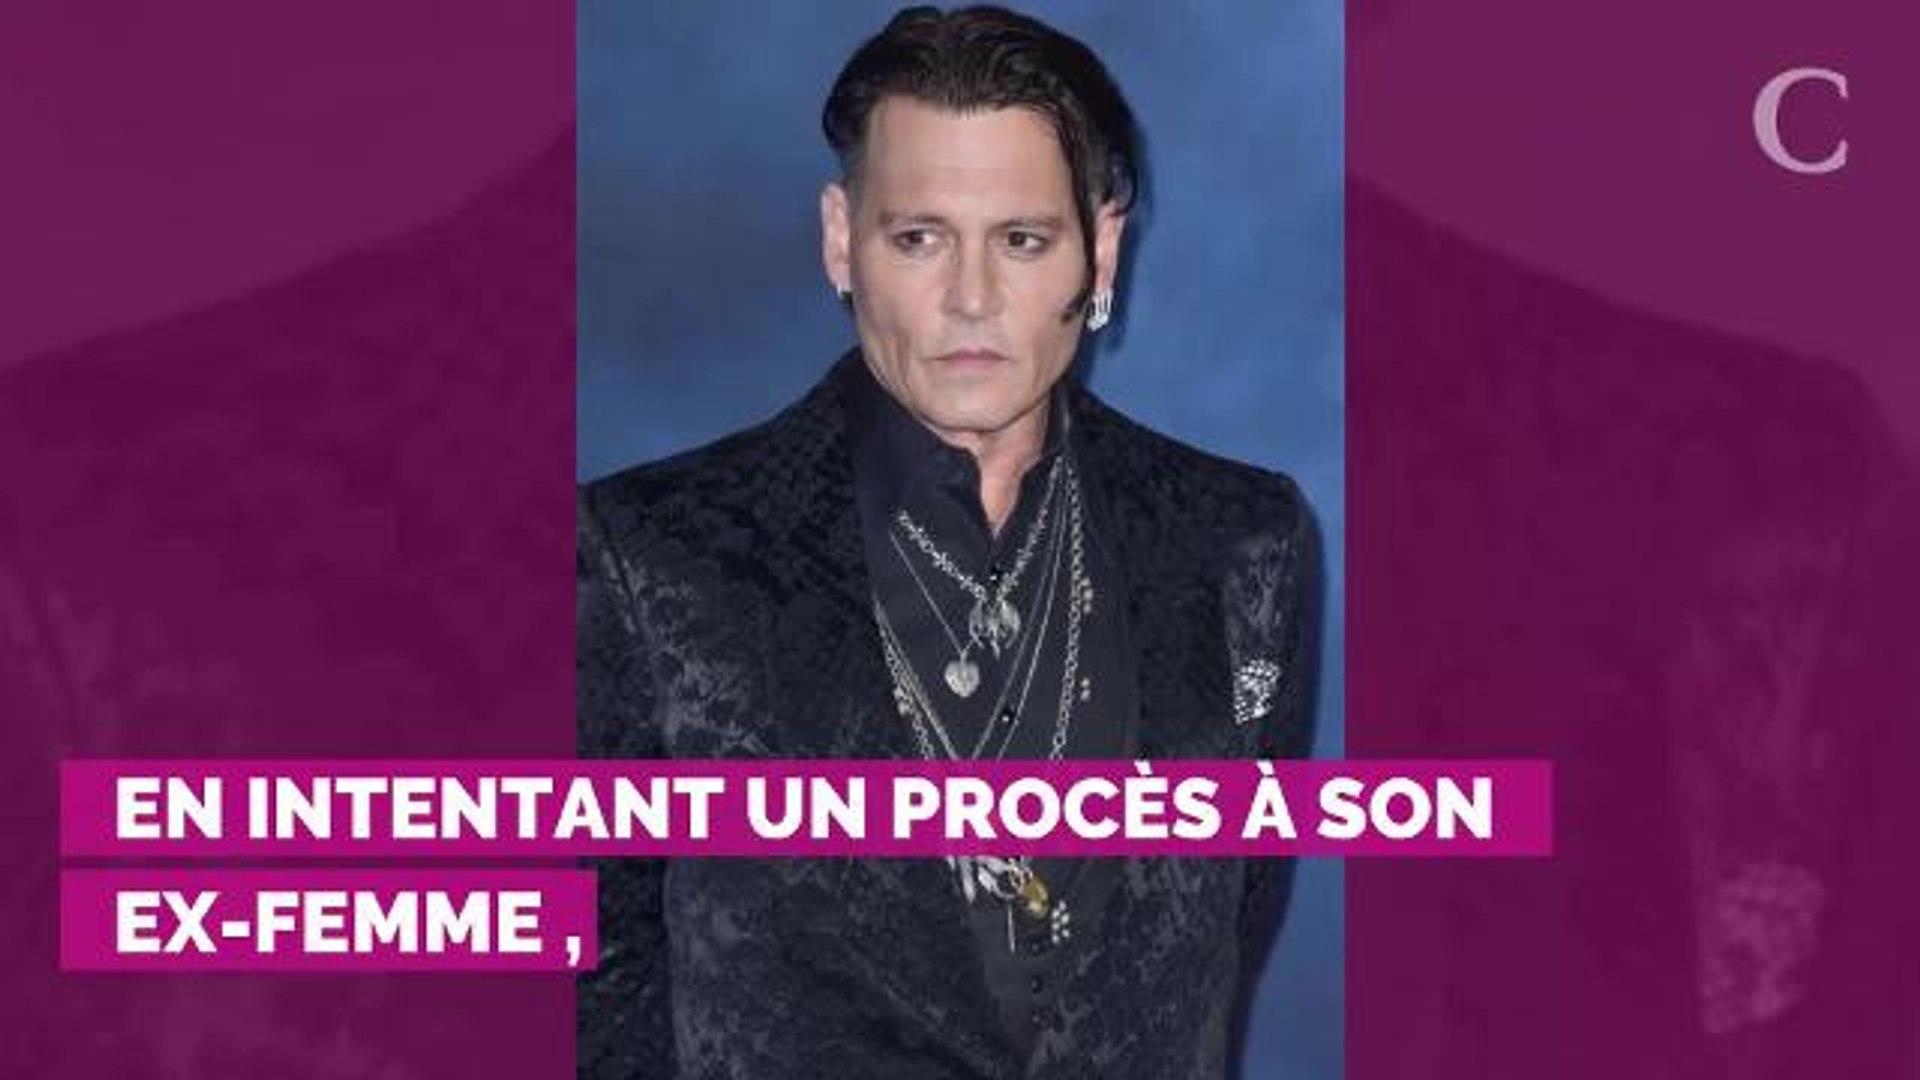 Et maintenant, Johnny Depp accuse Amber Heard de l'avoir trompé avec Elon Musk